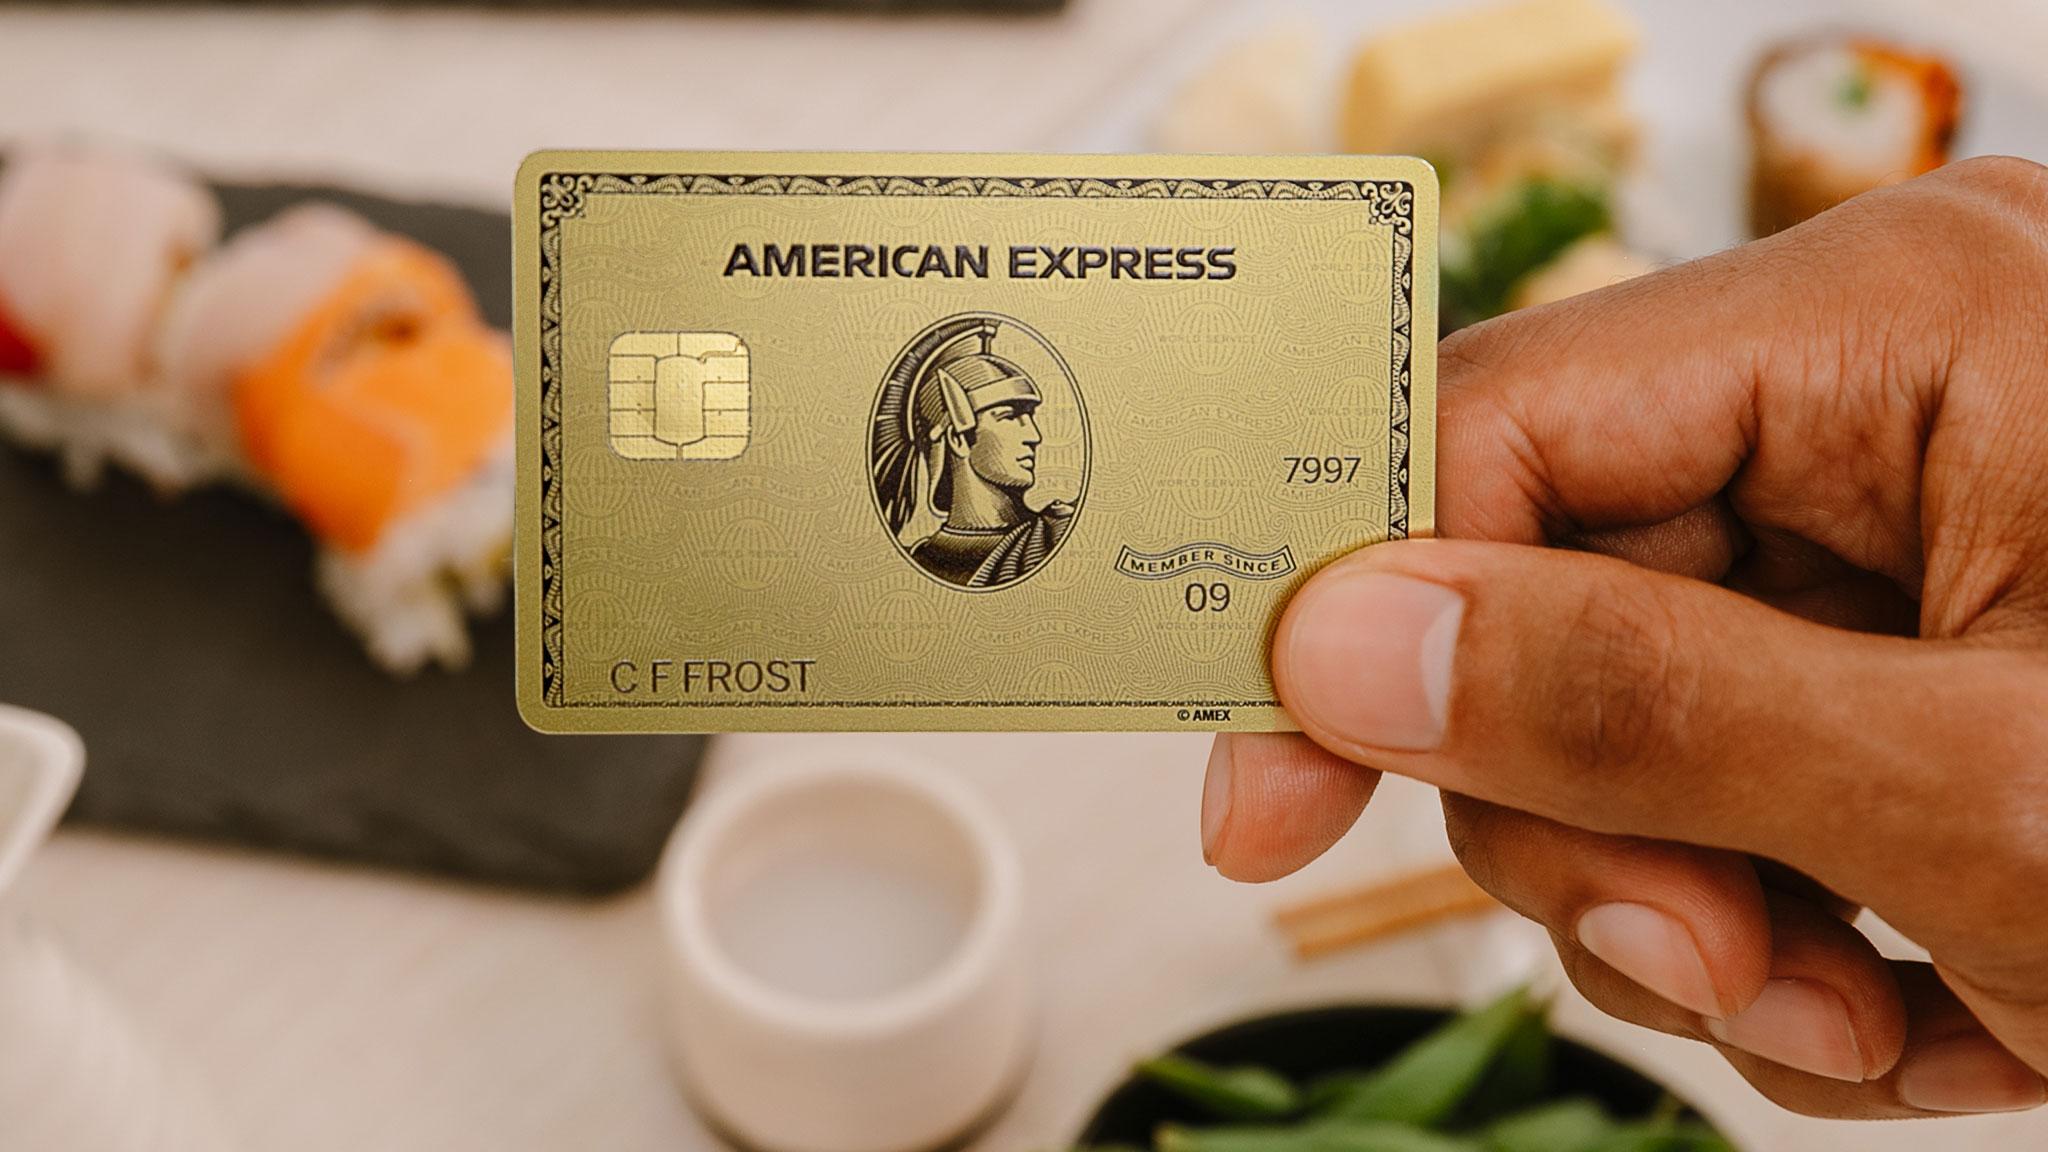 Amex Gold: Kreditkarte mit neuer Mobilitäts-Prämie - COMPUTER BILD